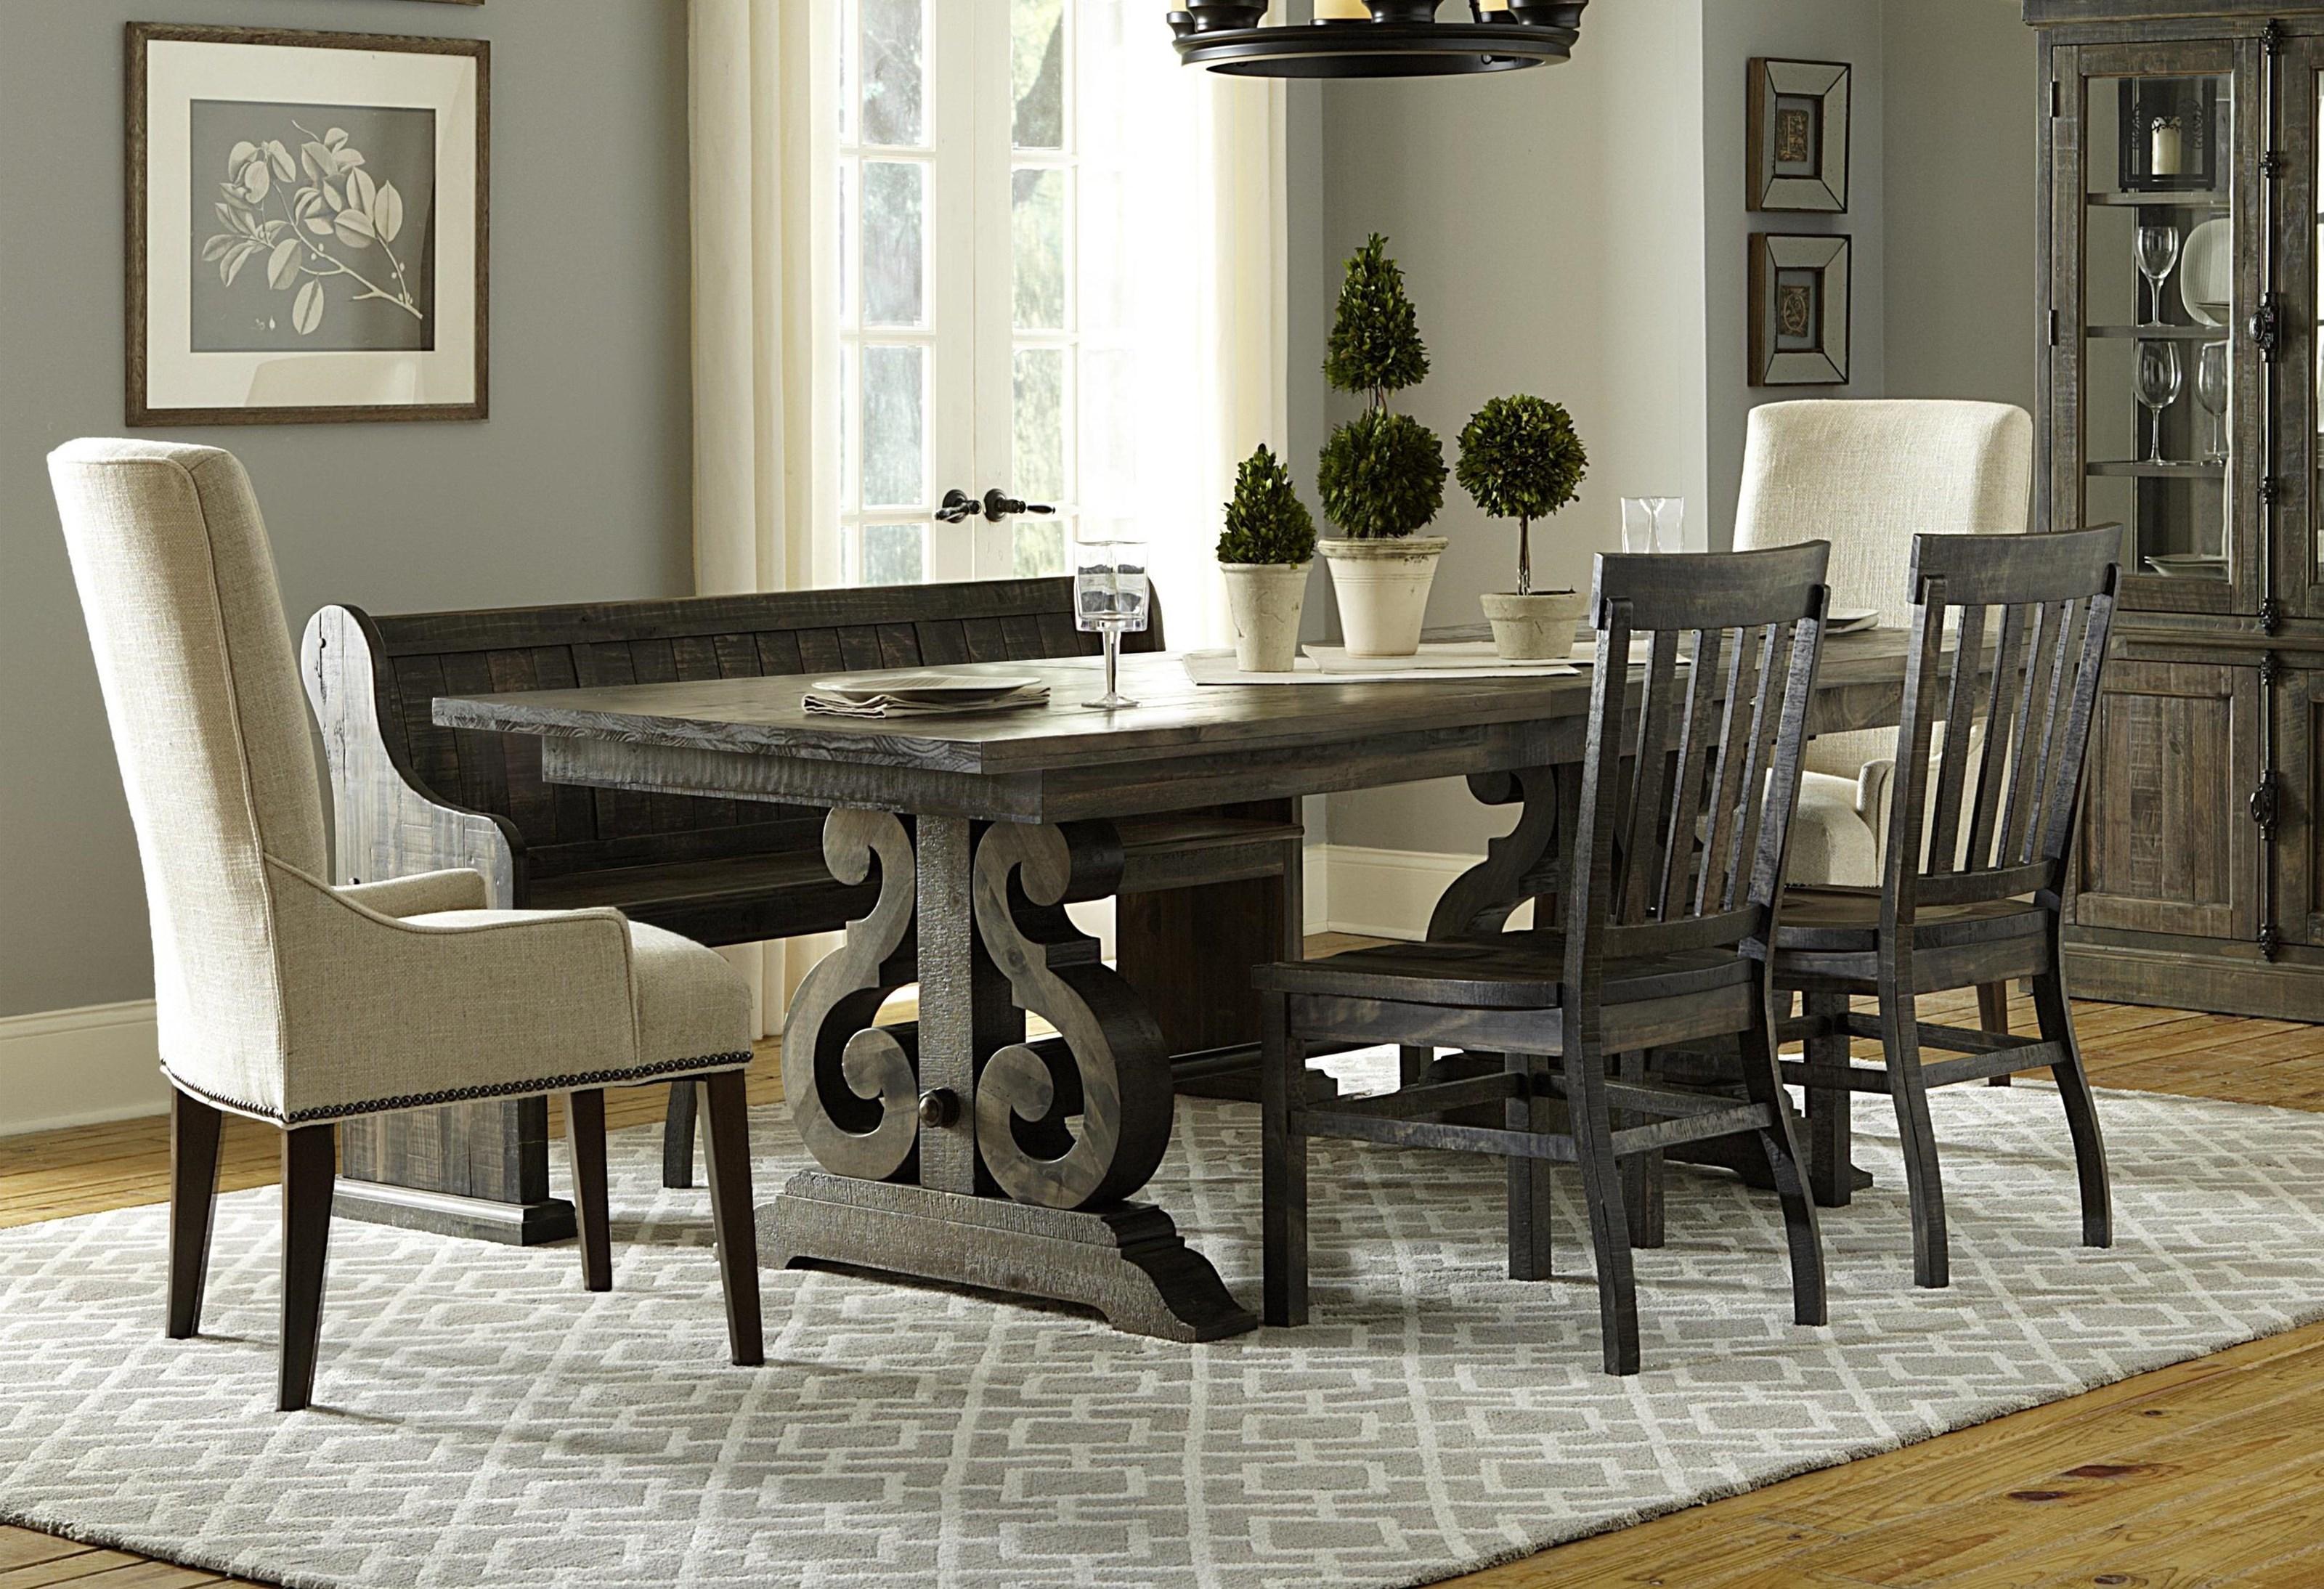 magnussen dining room furniture interior design ideas. Black Bedroom Furniture Sets. Home Design Ideas